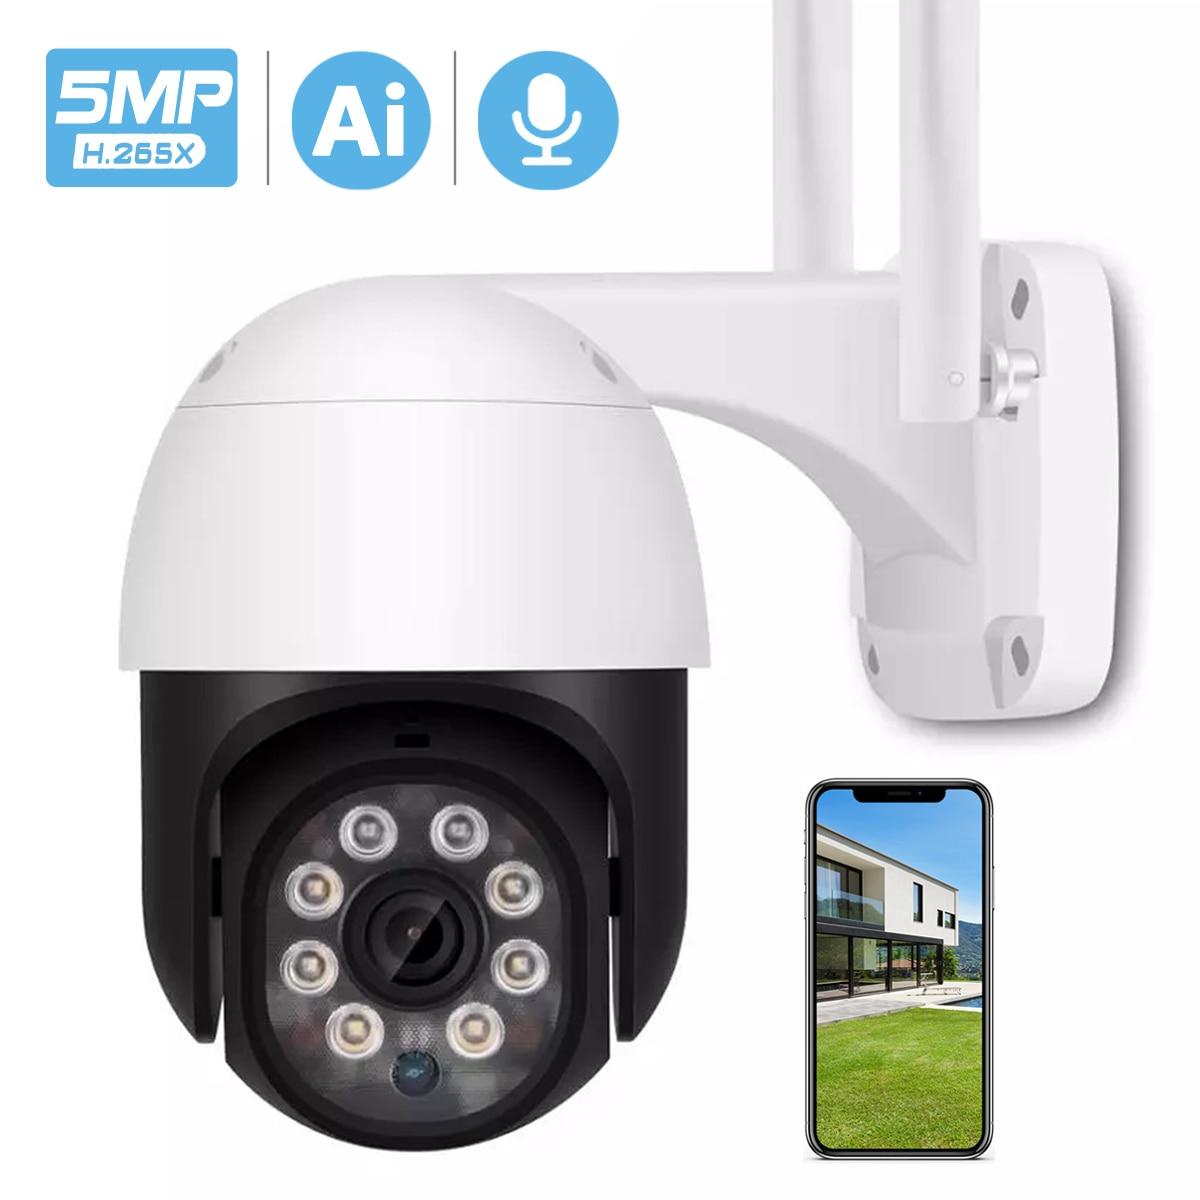 5MP HD PTZ Wifi Camera IP Outdoor Ai Human Detect Audio 1080P FHD IP Camera Color Night Vision 3MP Wifi Security CCTV IP Camera